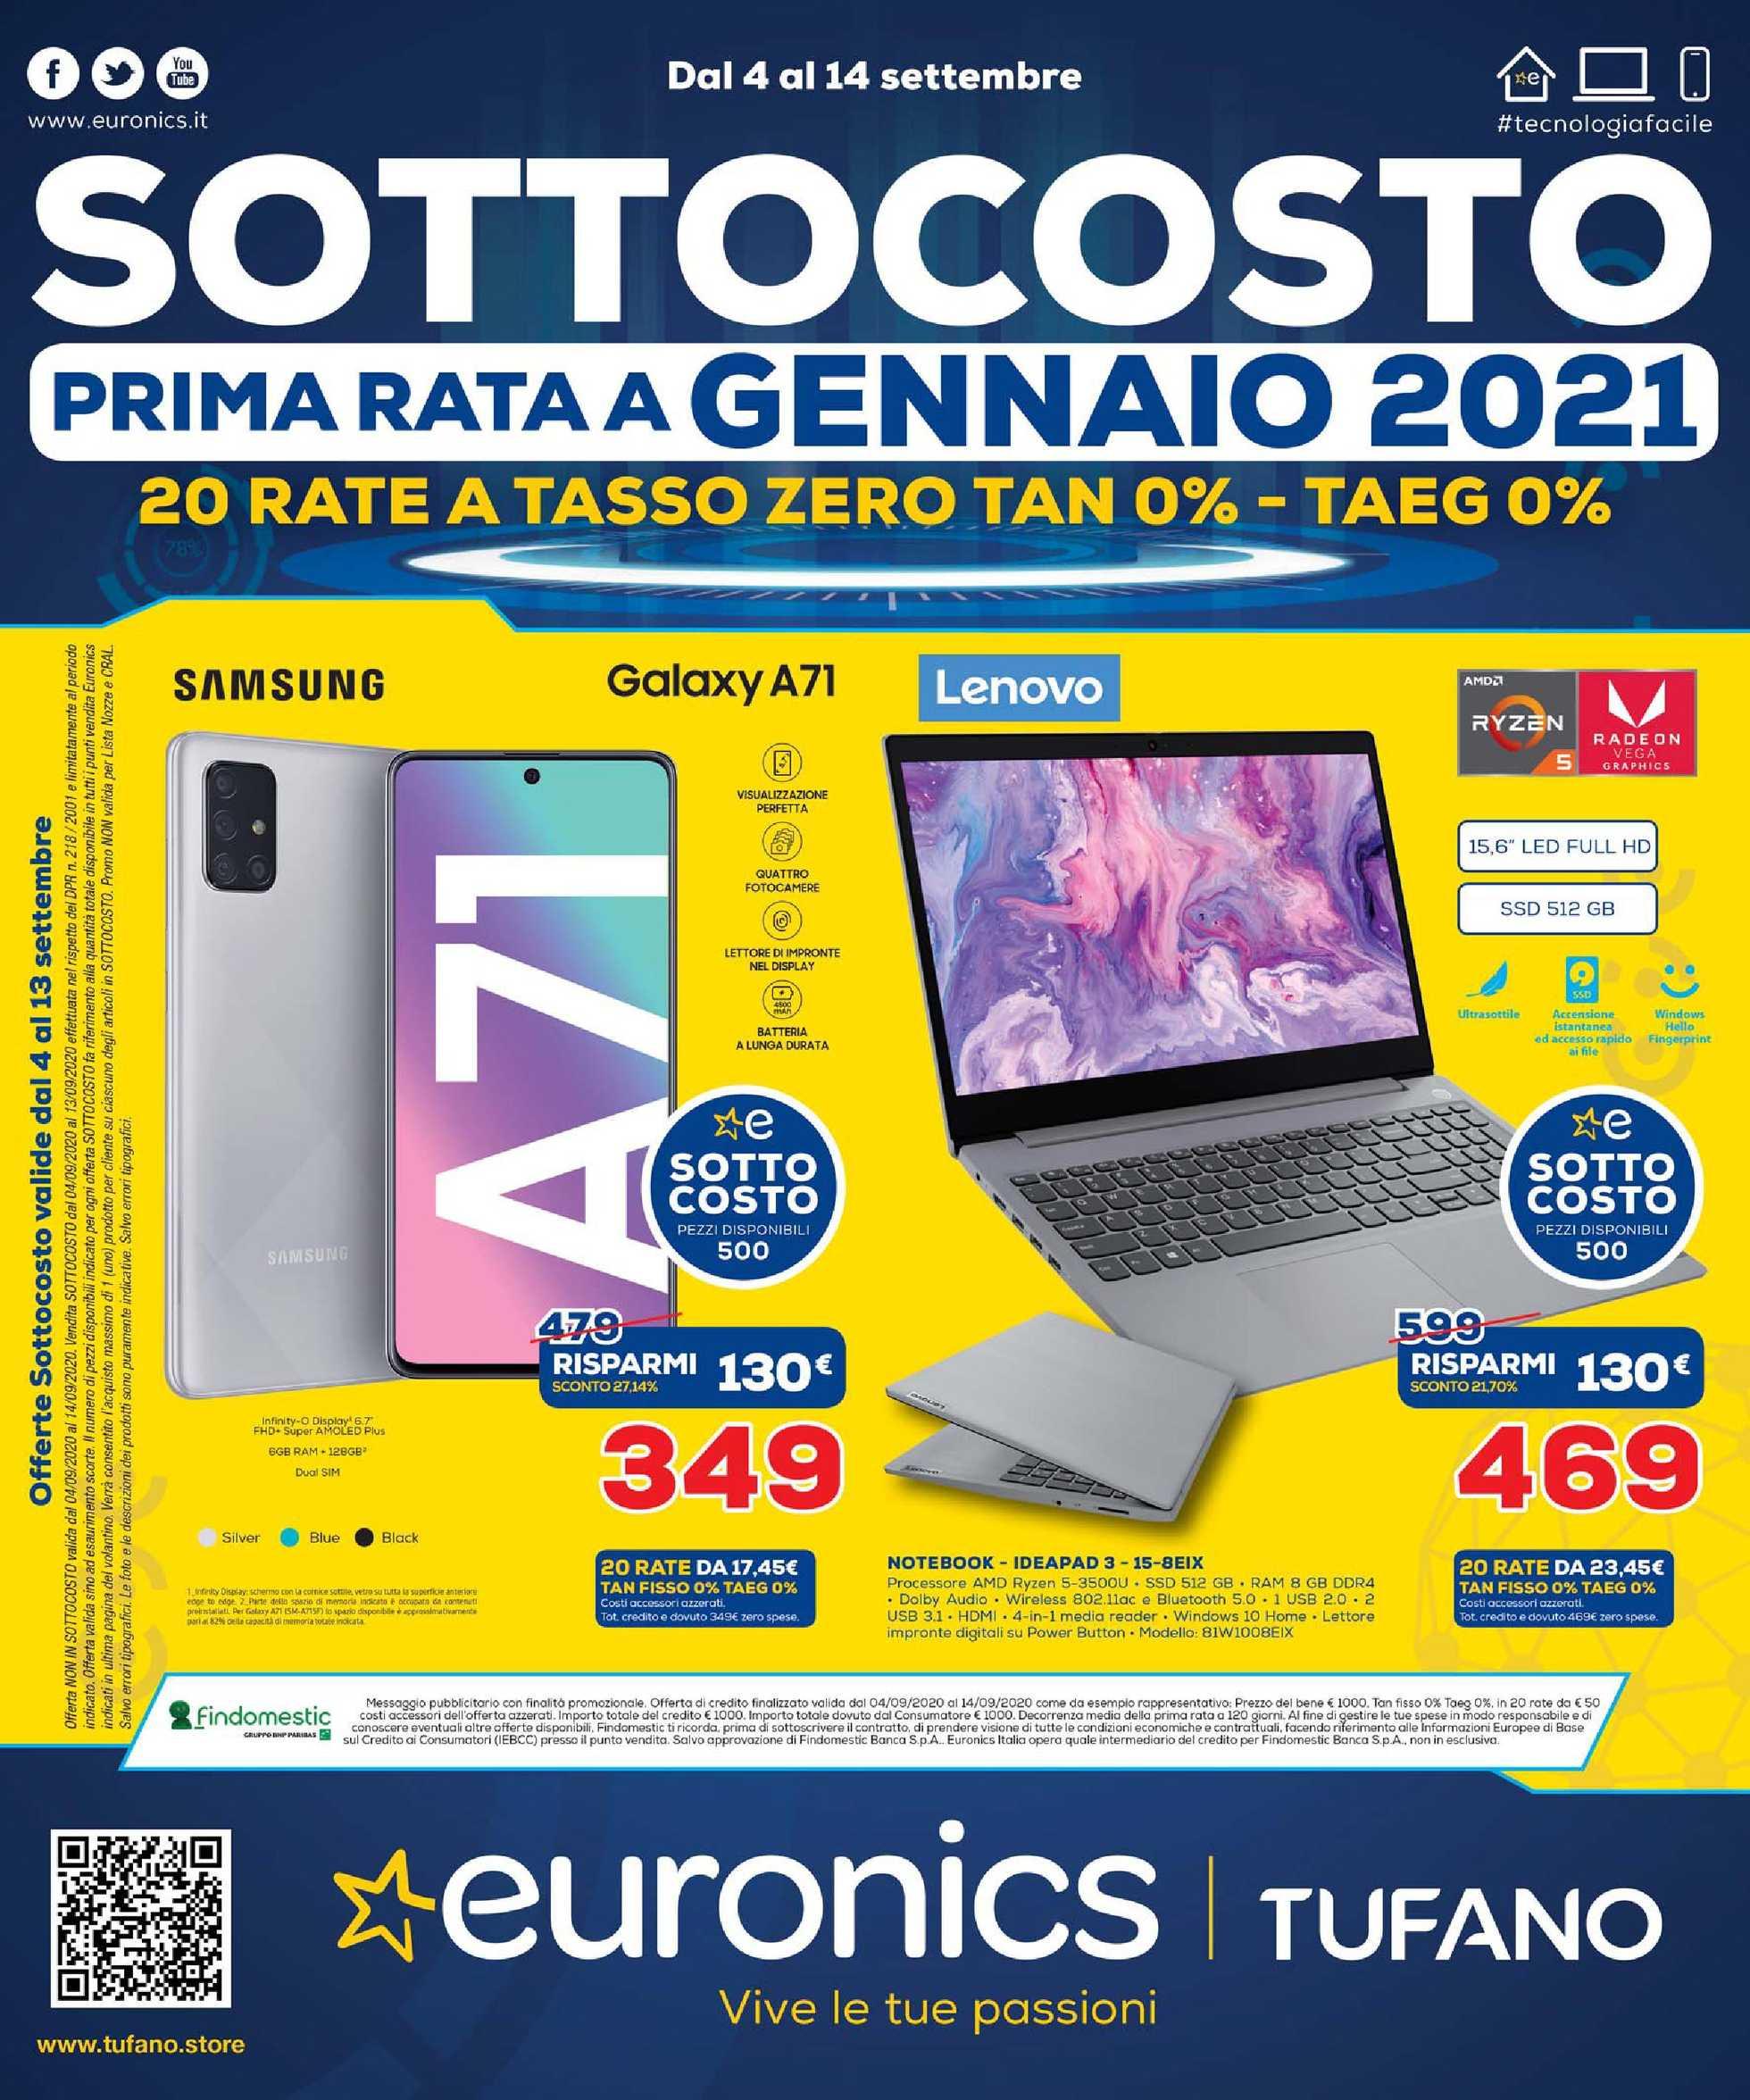 Euronics Bruno - offerte valide dal 04.09.2020 al 14.09.2020 - pagina 1.